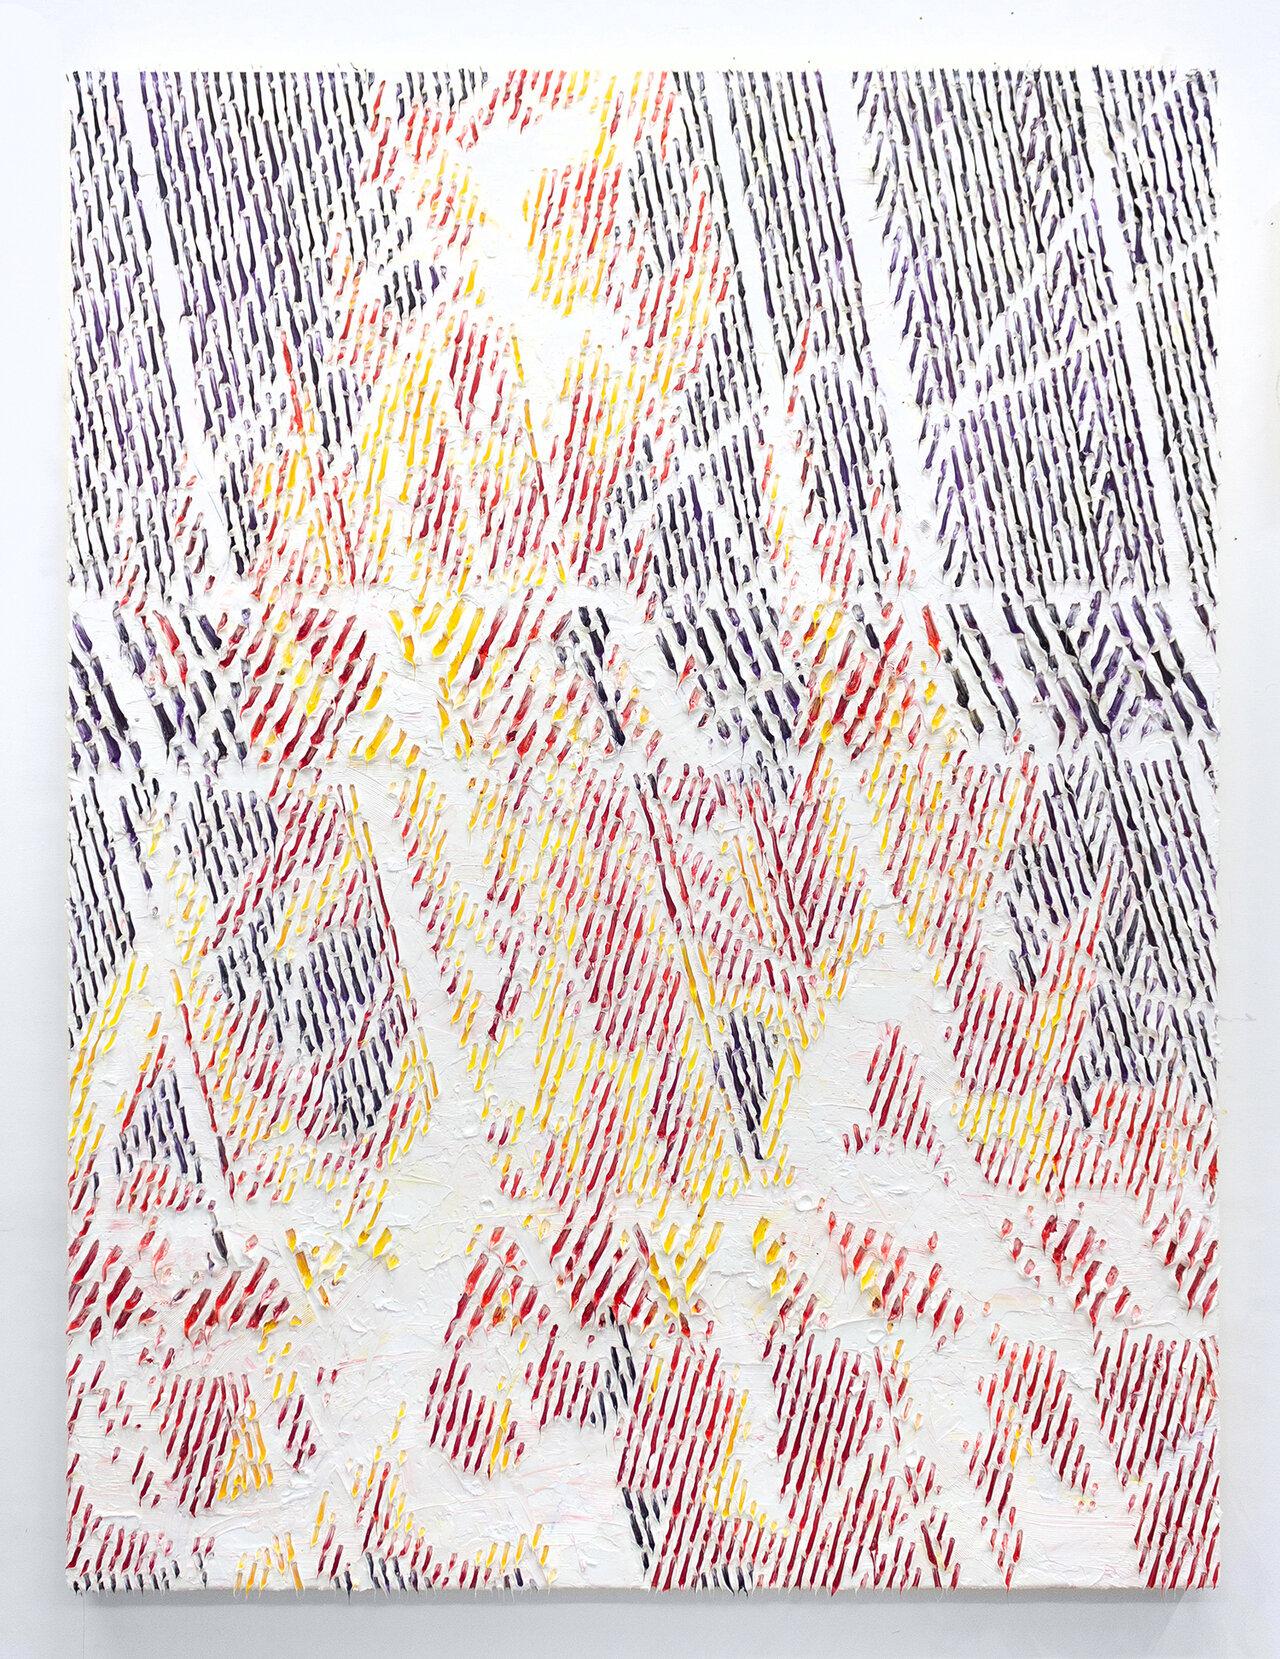 Light #19 2021, 162 x 130.3 cm, Oil on canvas ©Shinya Imanishi Courtesy of nca | nichido contemporary art